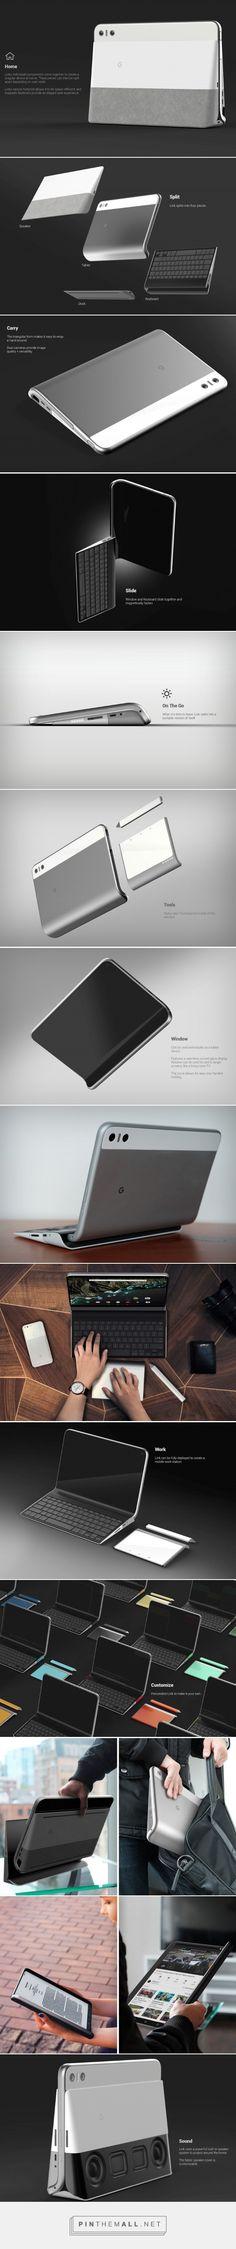 Google's most innovative gadget yet?   Yanko Design - created via https://pinthemall.net